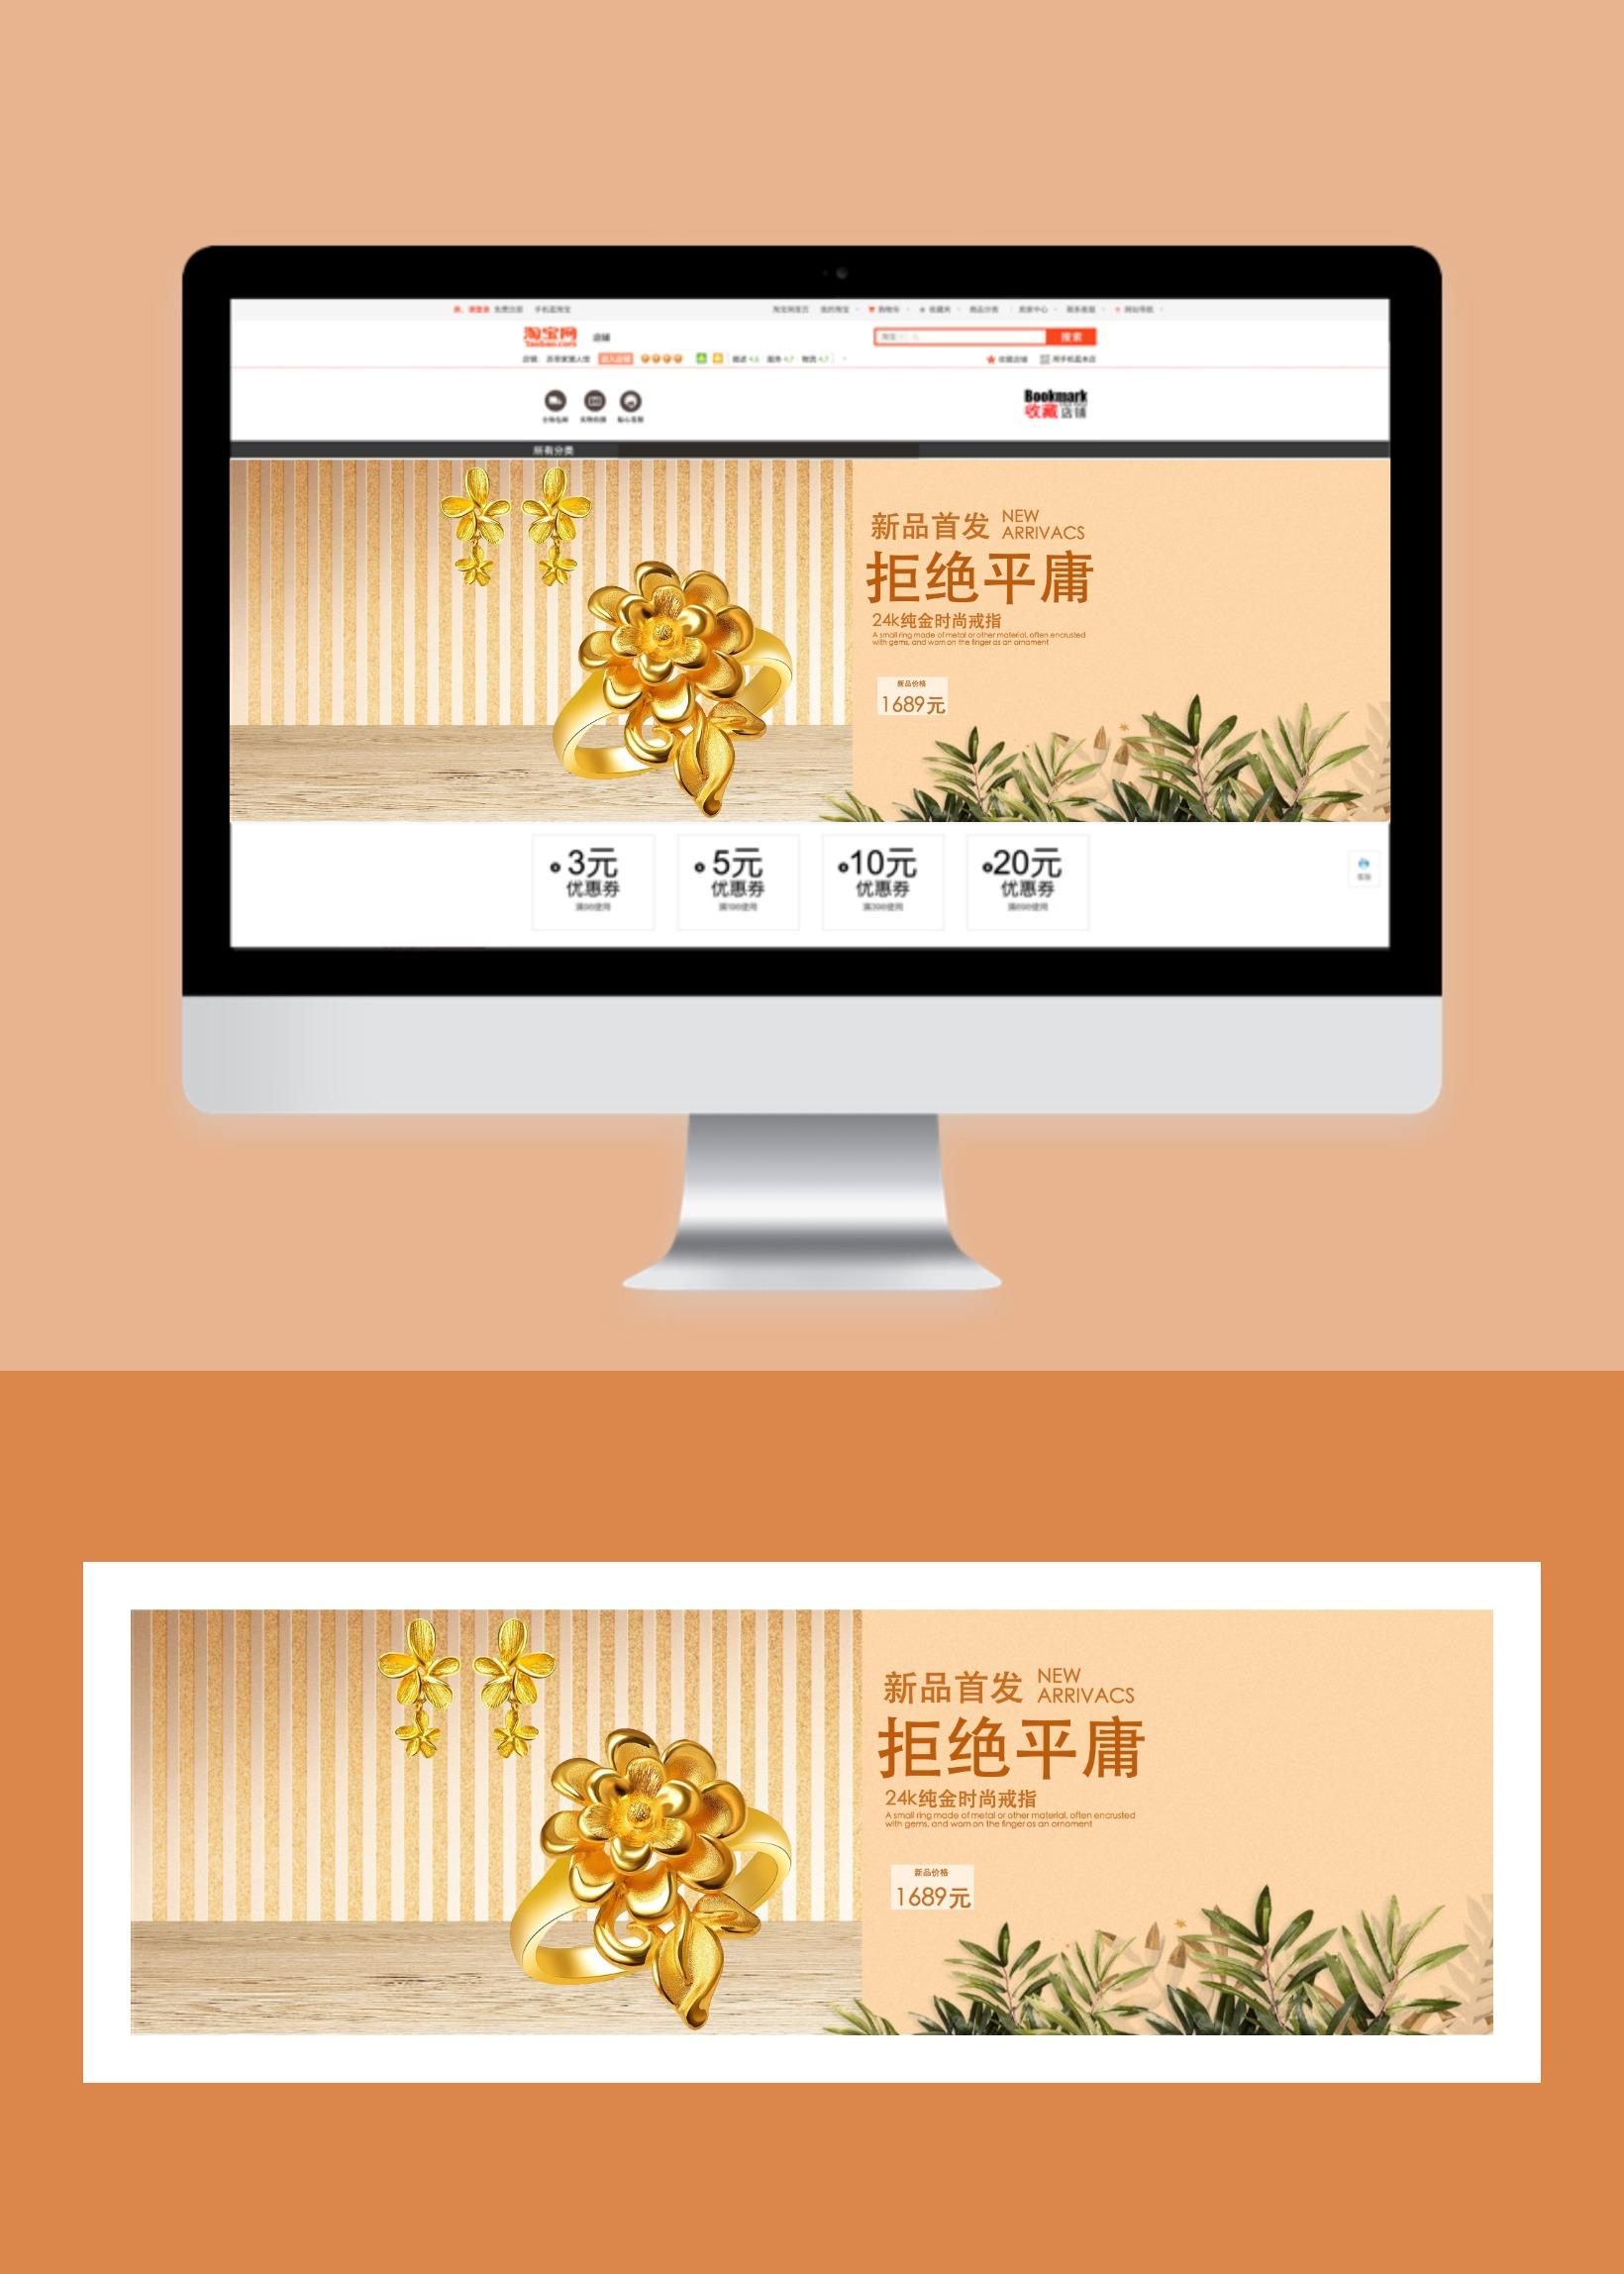 24k纯金戒指精品珠宝新品首发电商banner